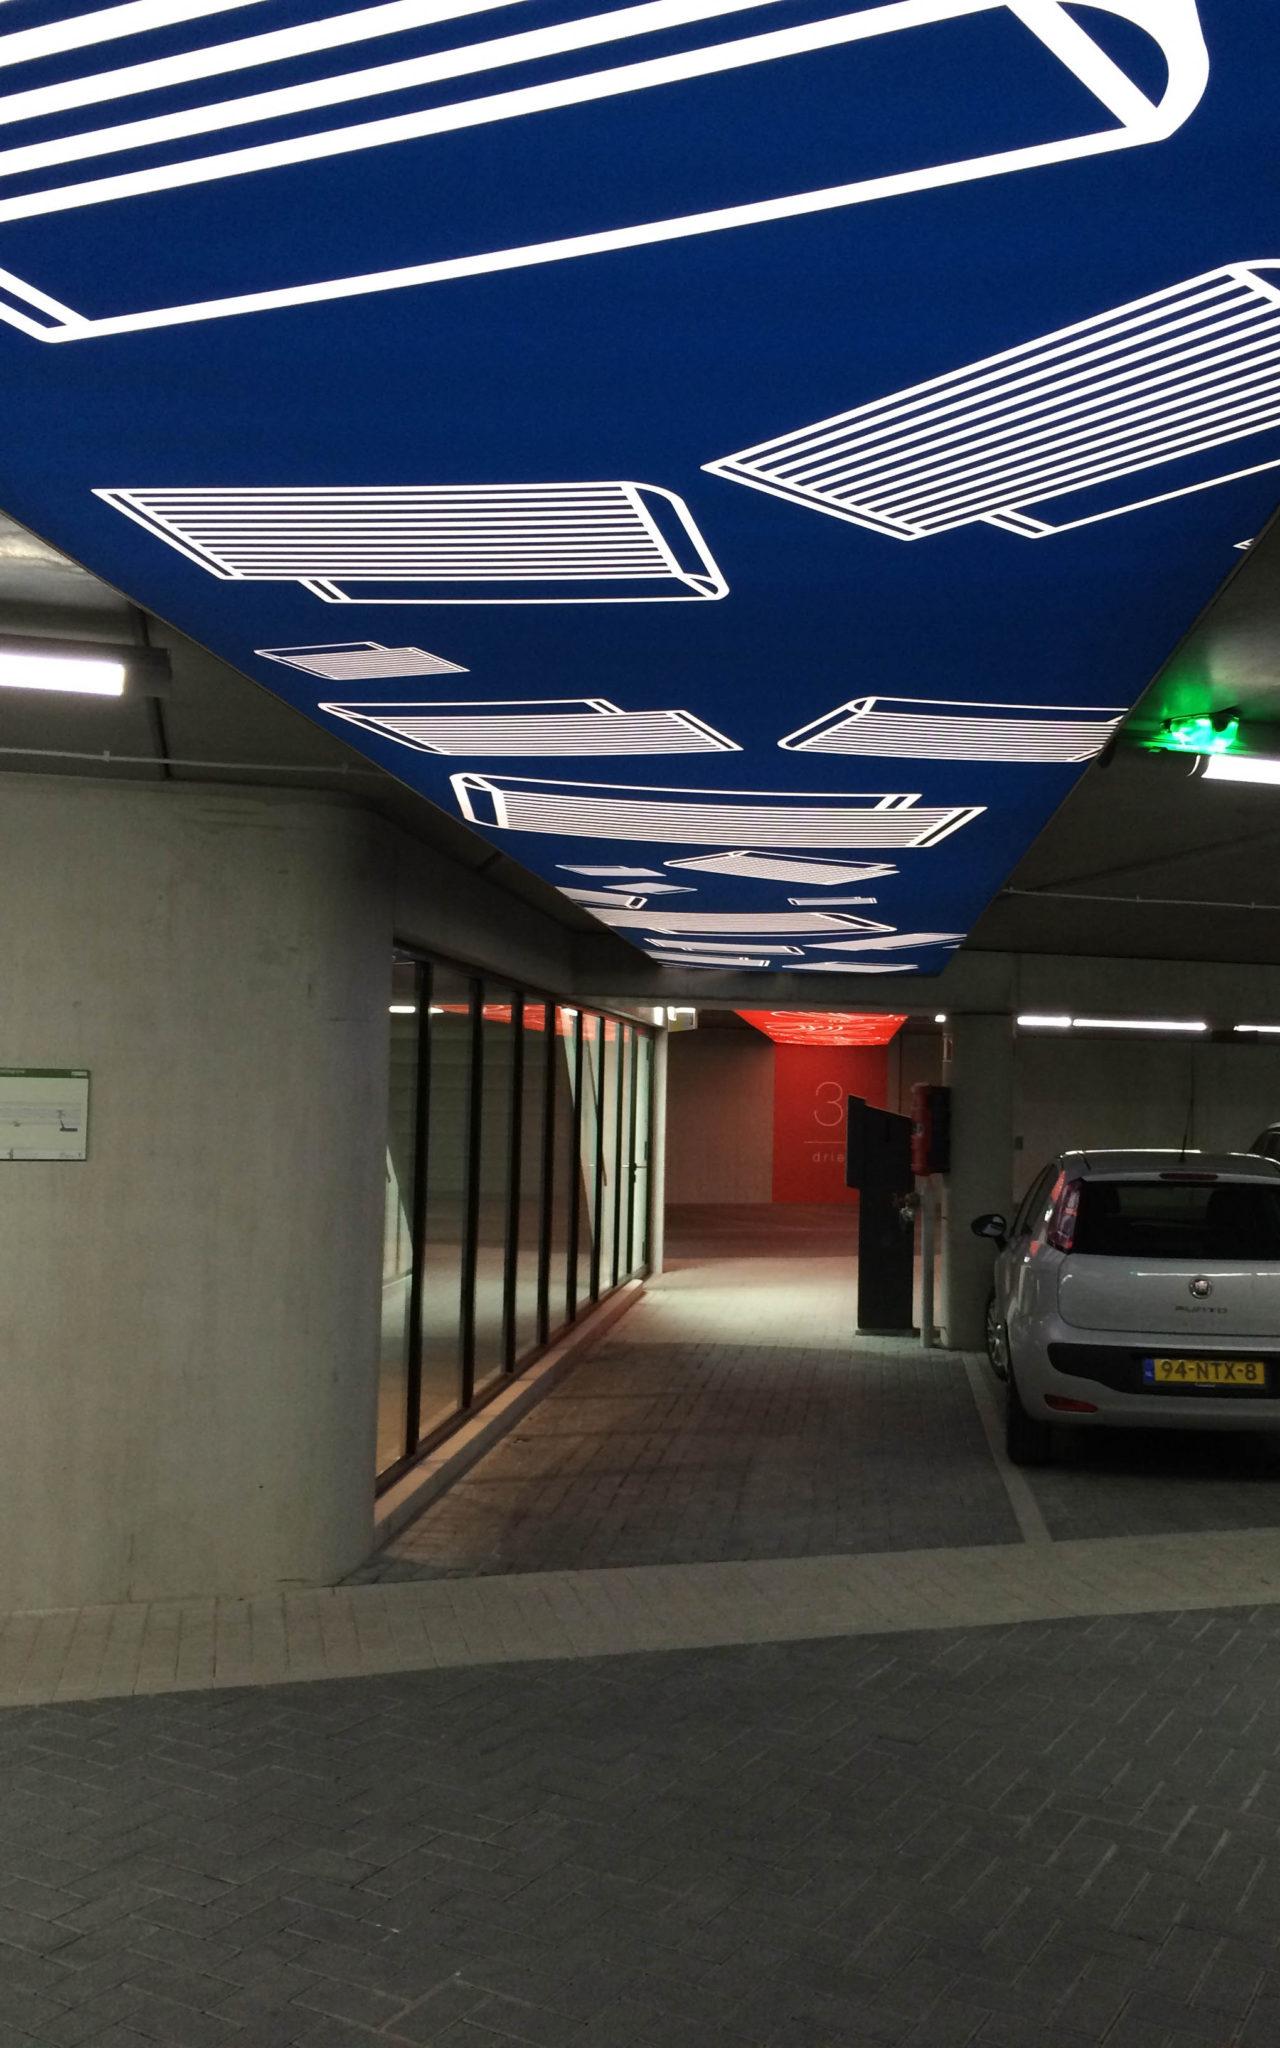 Parkeergarage boulevard (15 of 15)